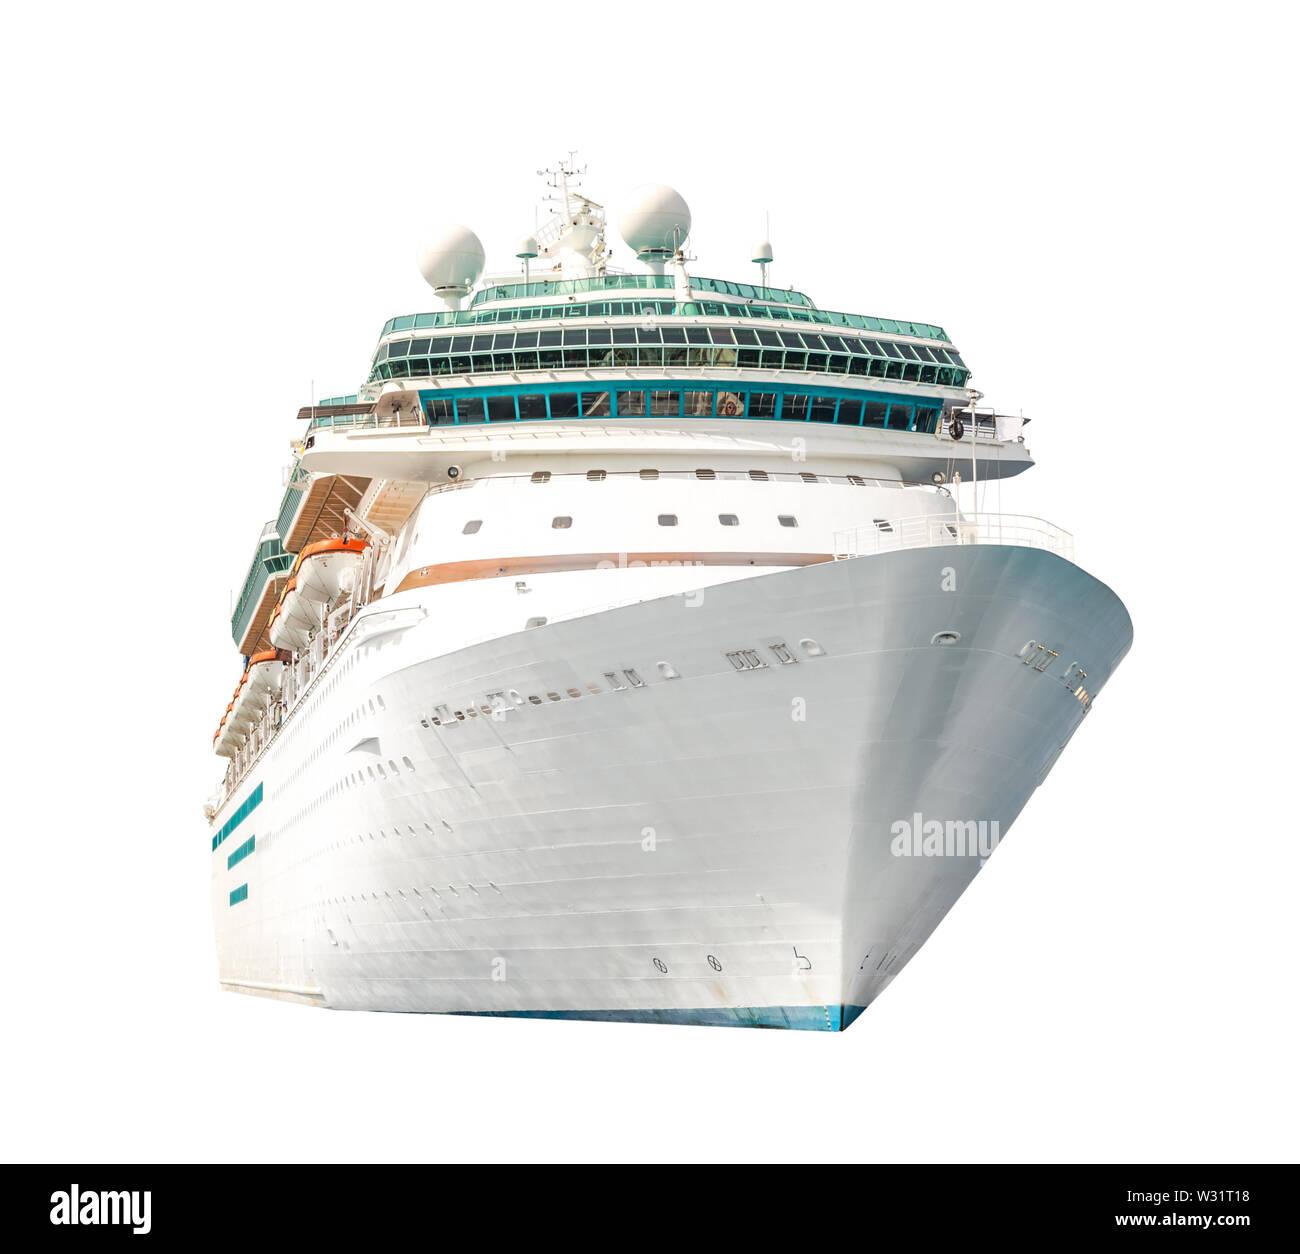 Origami Class: Diamond Princess Cruise Ship - Cruise Critic | 1254x1300